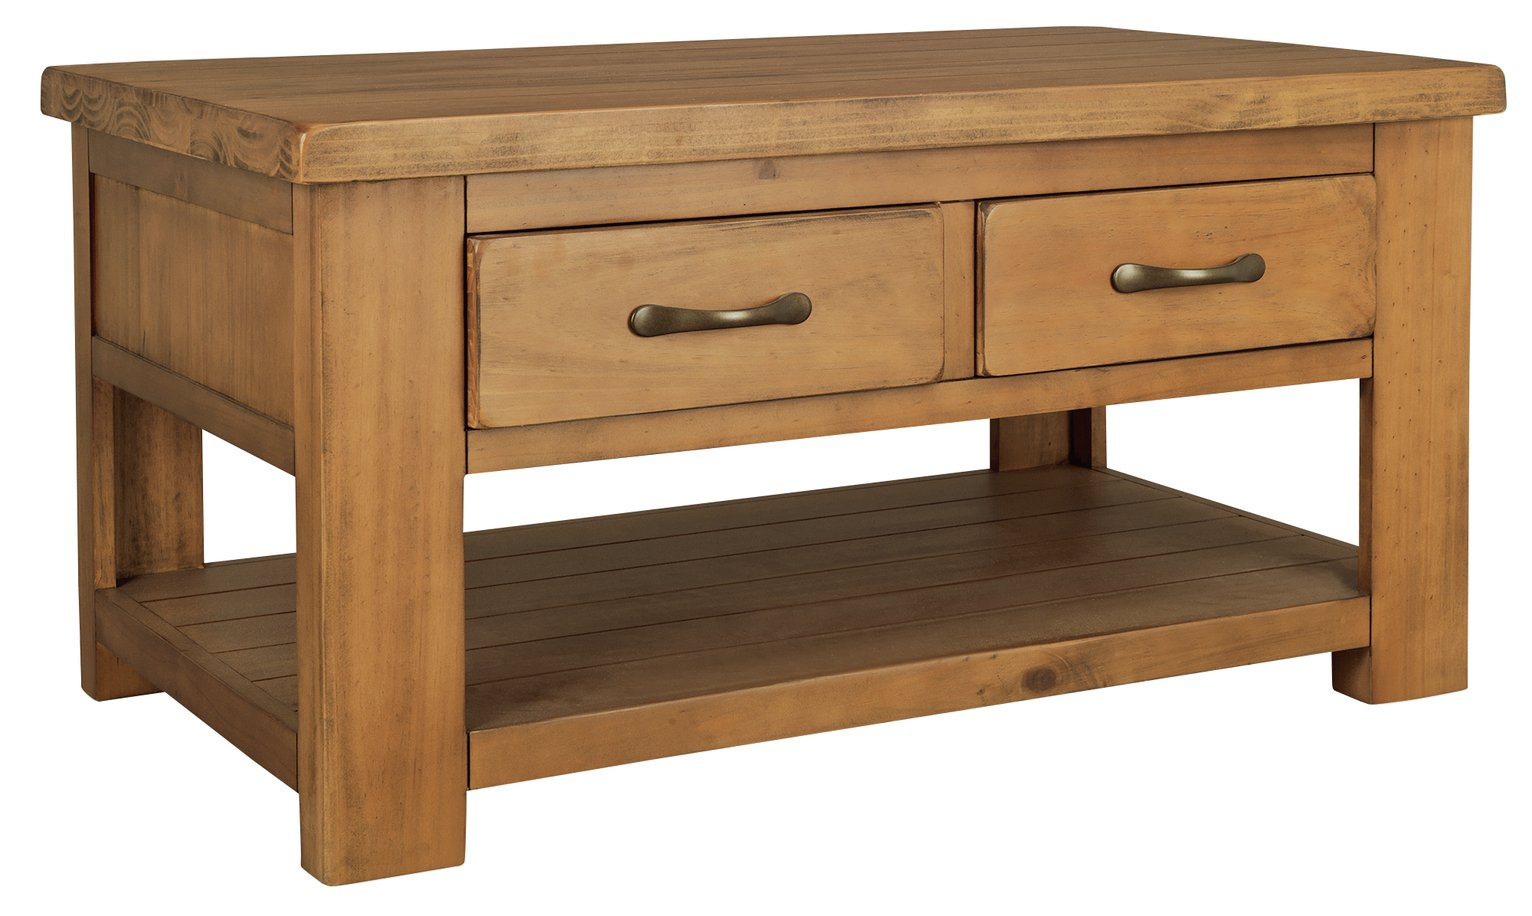 Argos Home Arizona 2 Drawer 1 Shelf Solid Pine Coffee Table